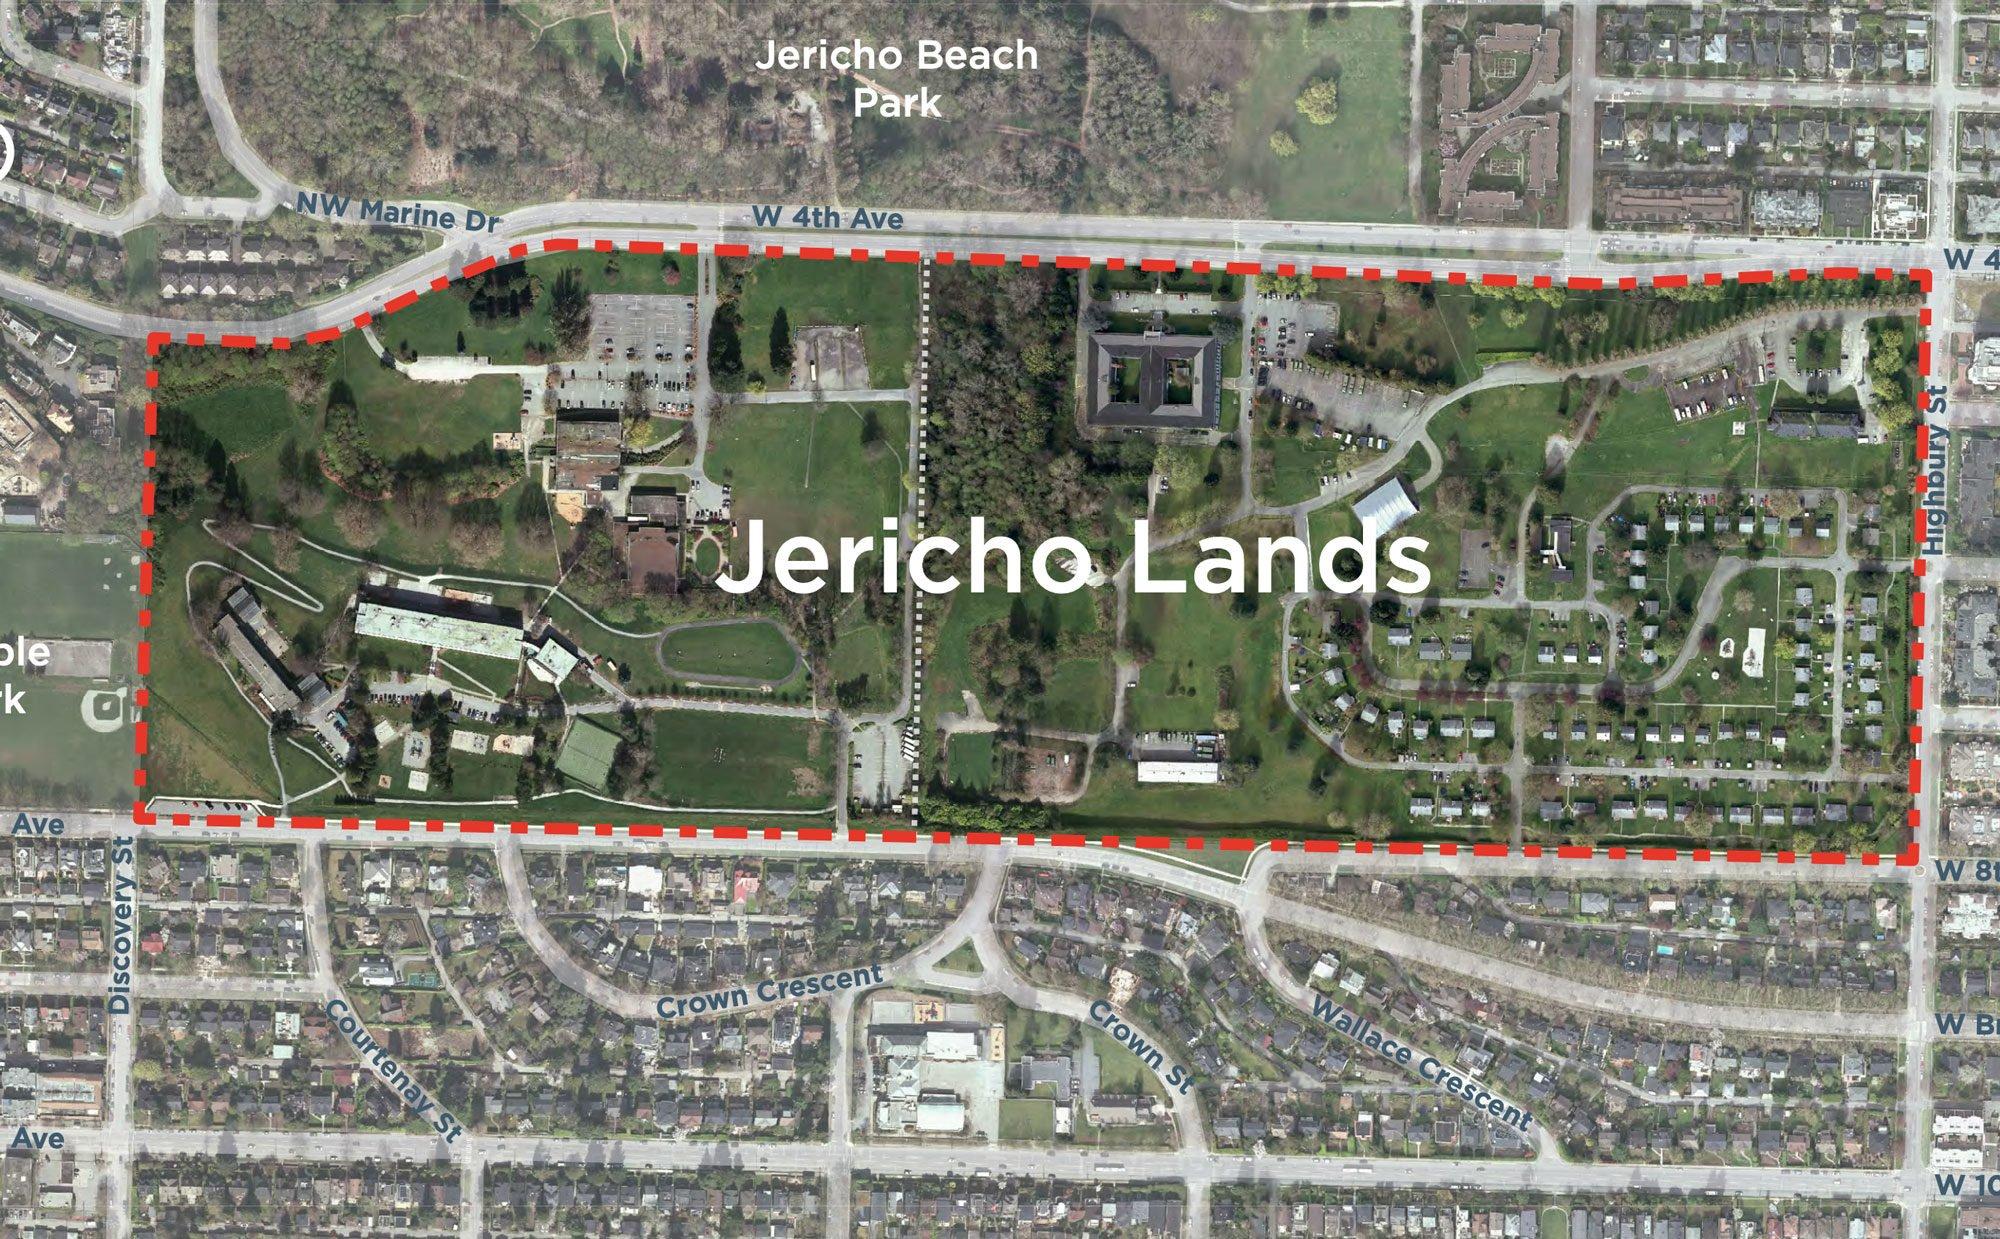 Planning process for 90-acre Jericho Lands site begins